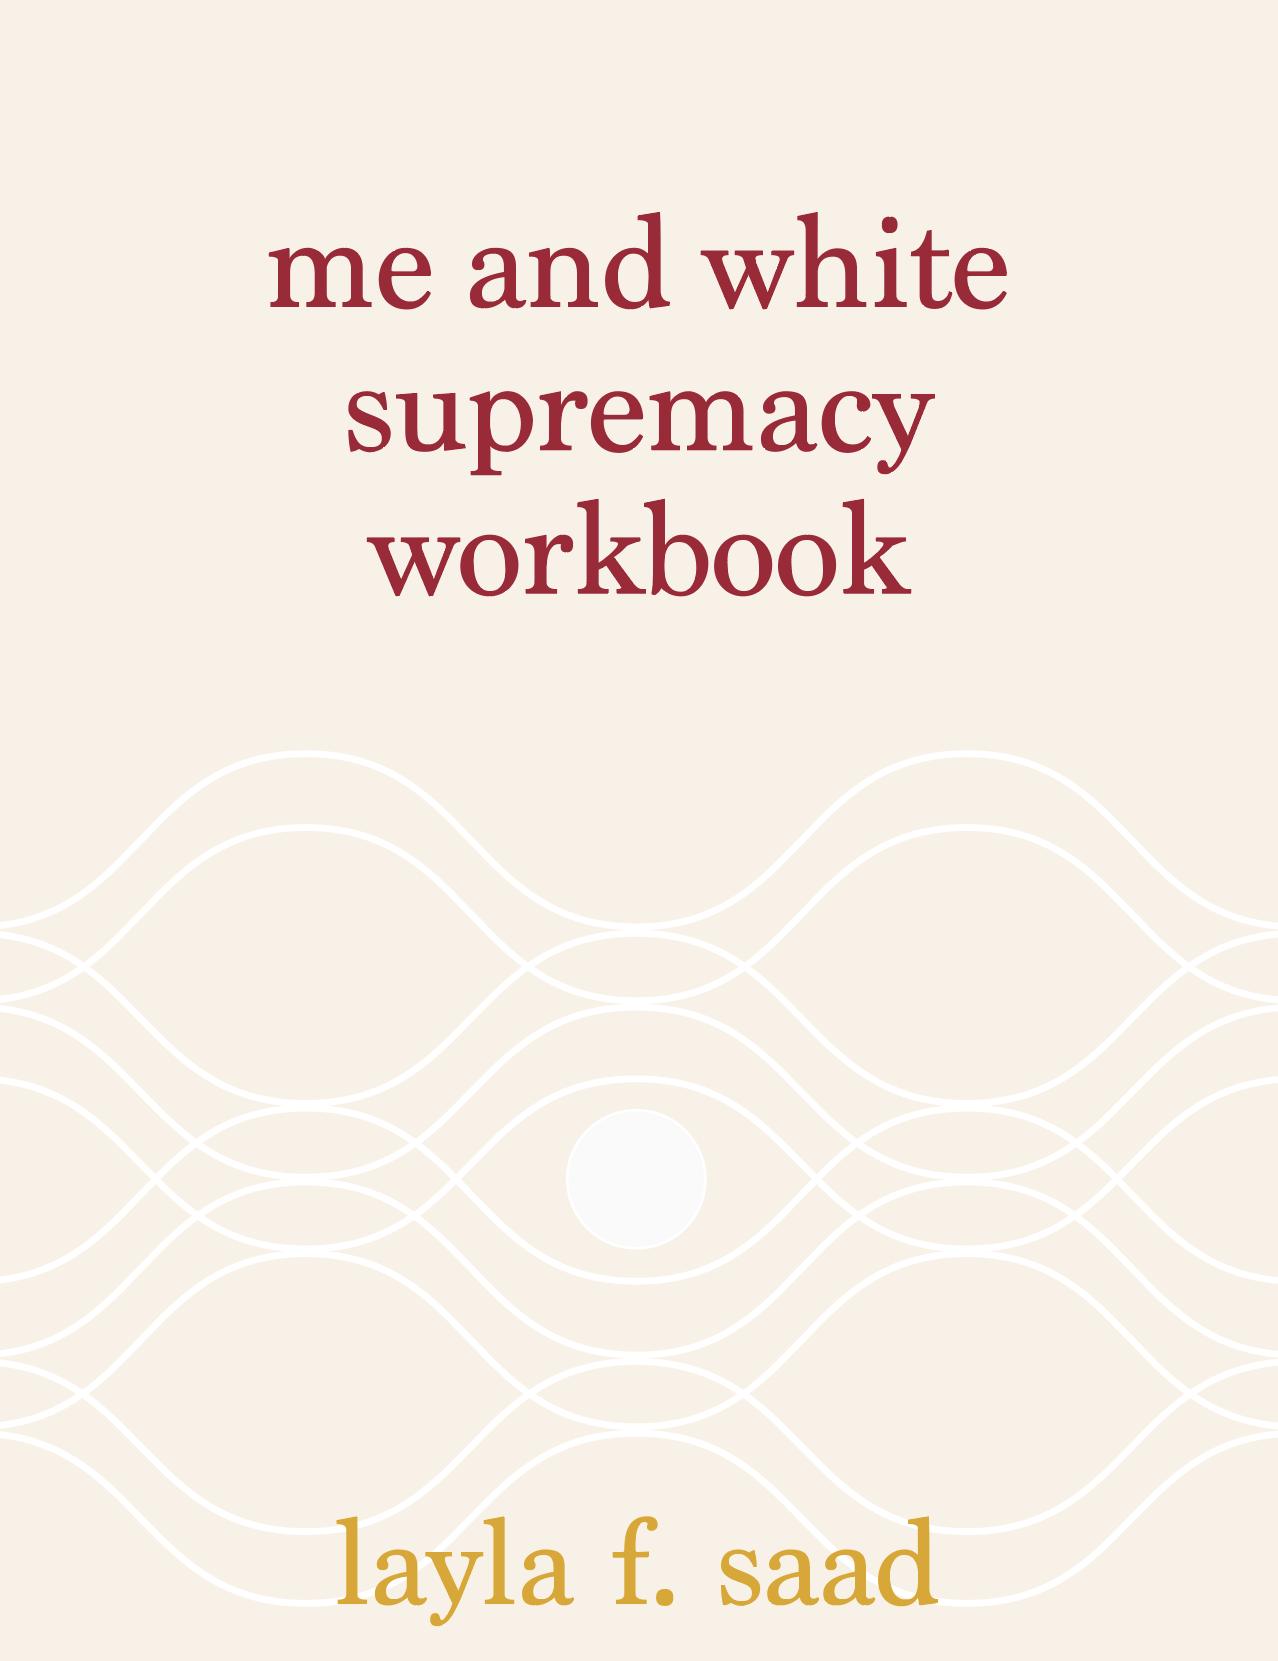 Me and White Supremacy Workbook